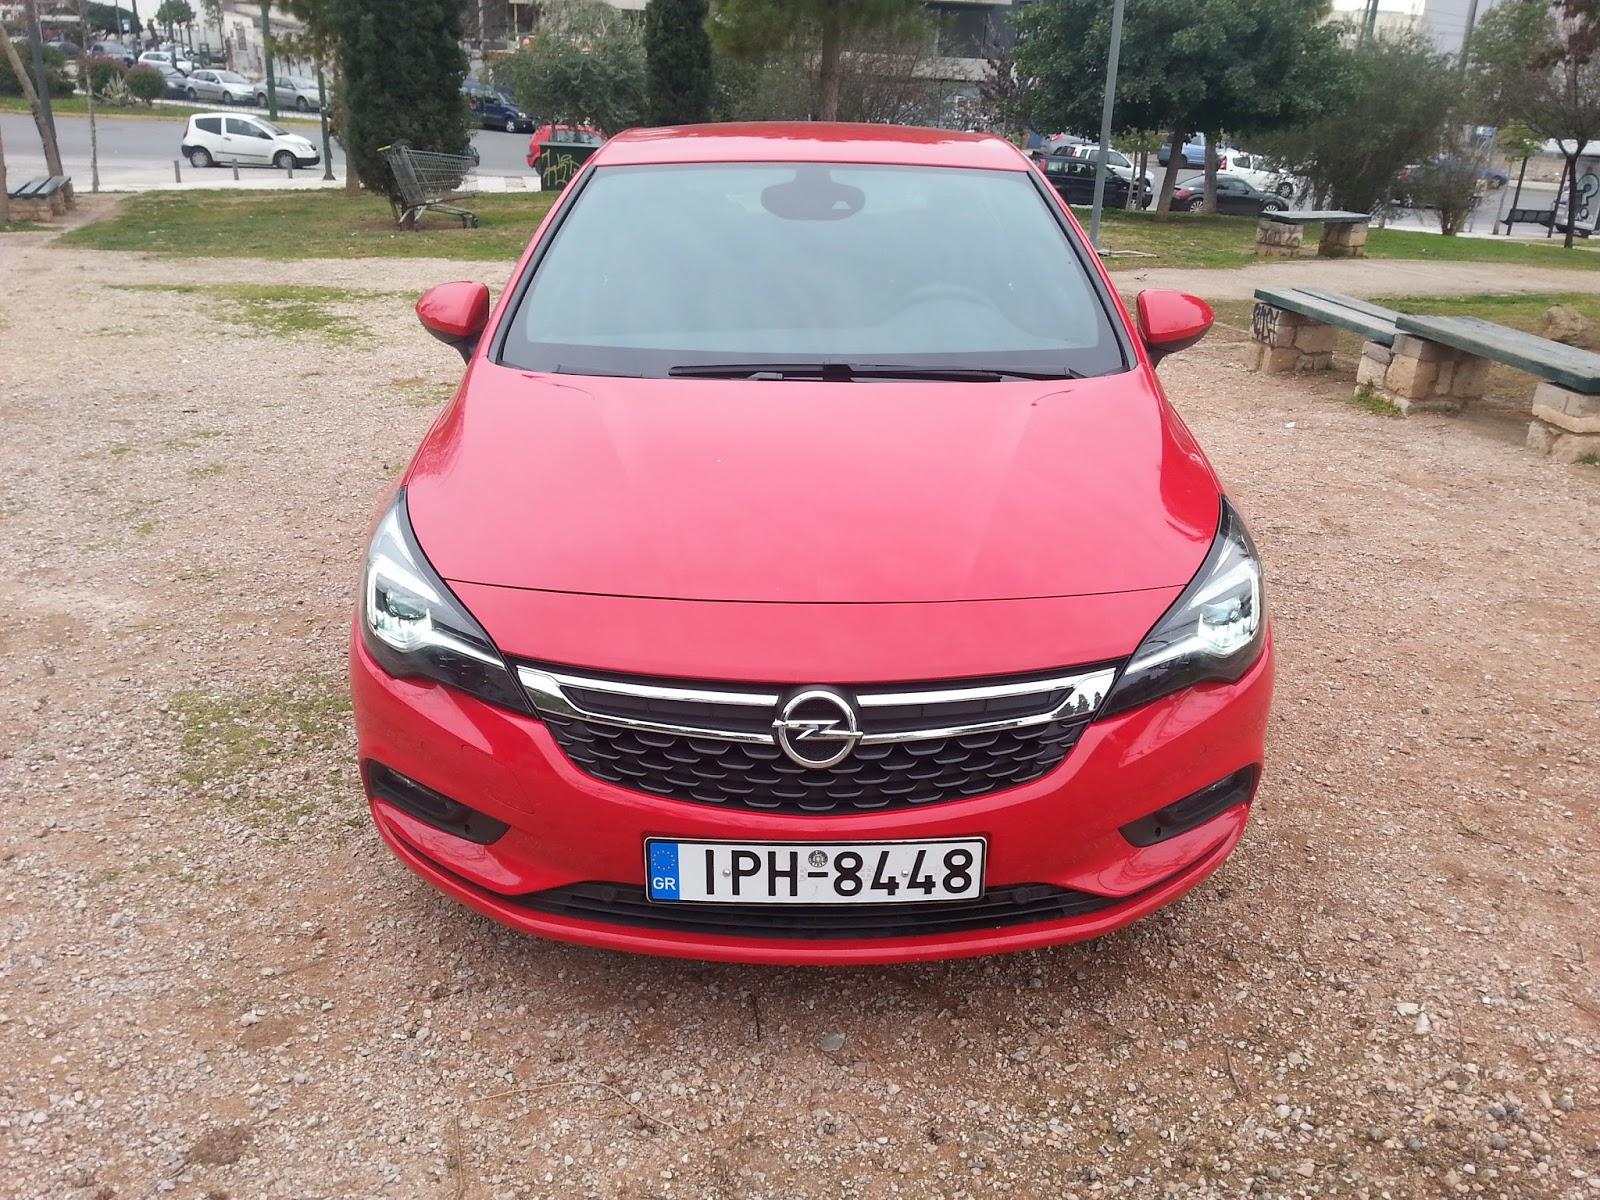 astrats2 Πόσο αστέρι είναι, τελικά, το νέο Astra; Diesel, Opel, Opel Astra, TEST, zblog, ΔΟΚΙΜΕΣ, οδηγούμε